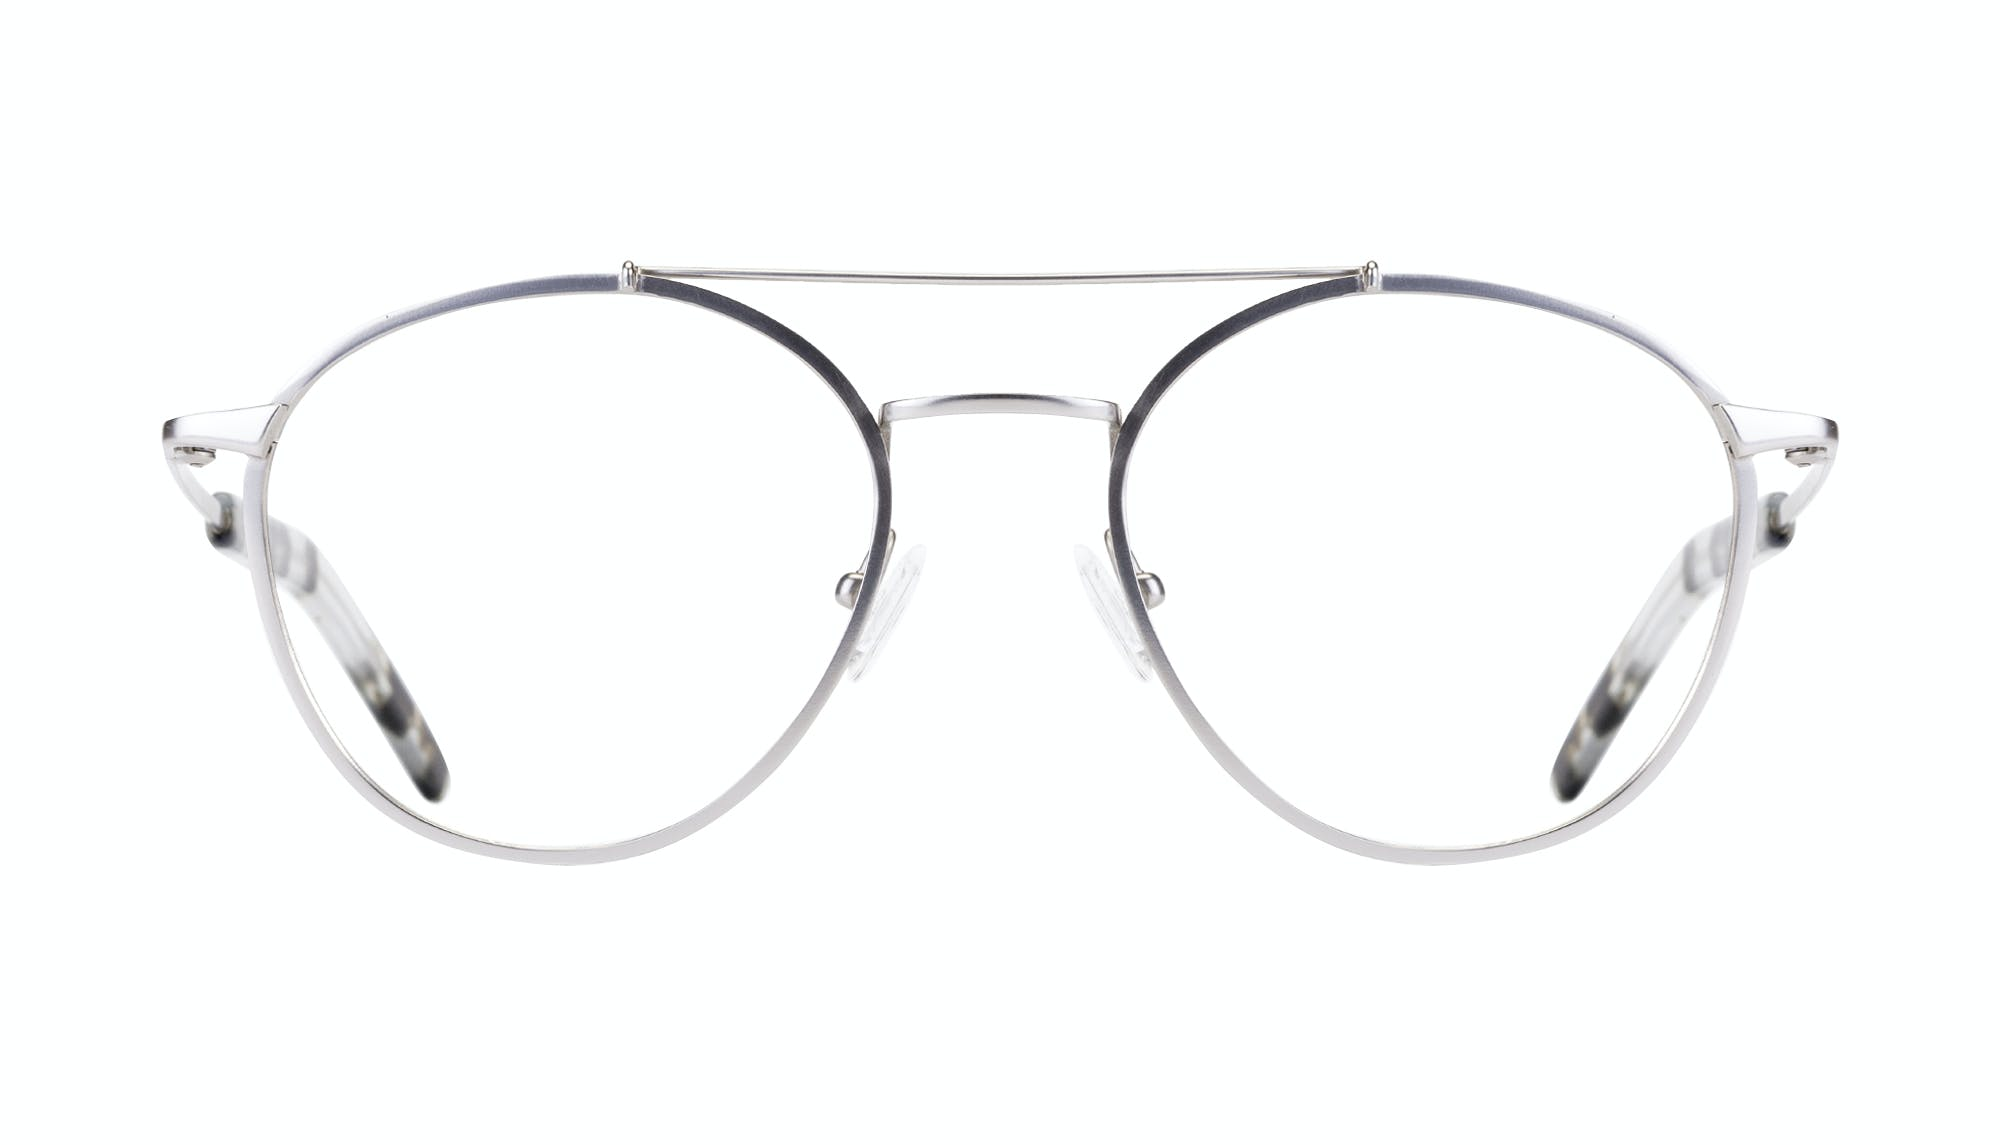 Affordable Fashion Glasses Aviator Eyeglasses Men Gravity Silver Front